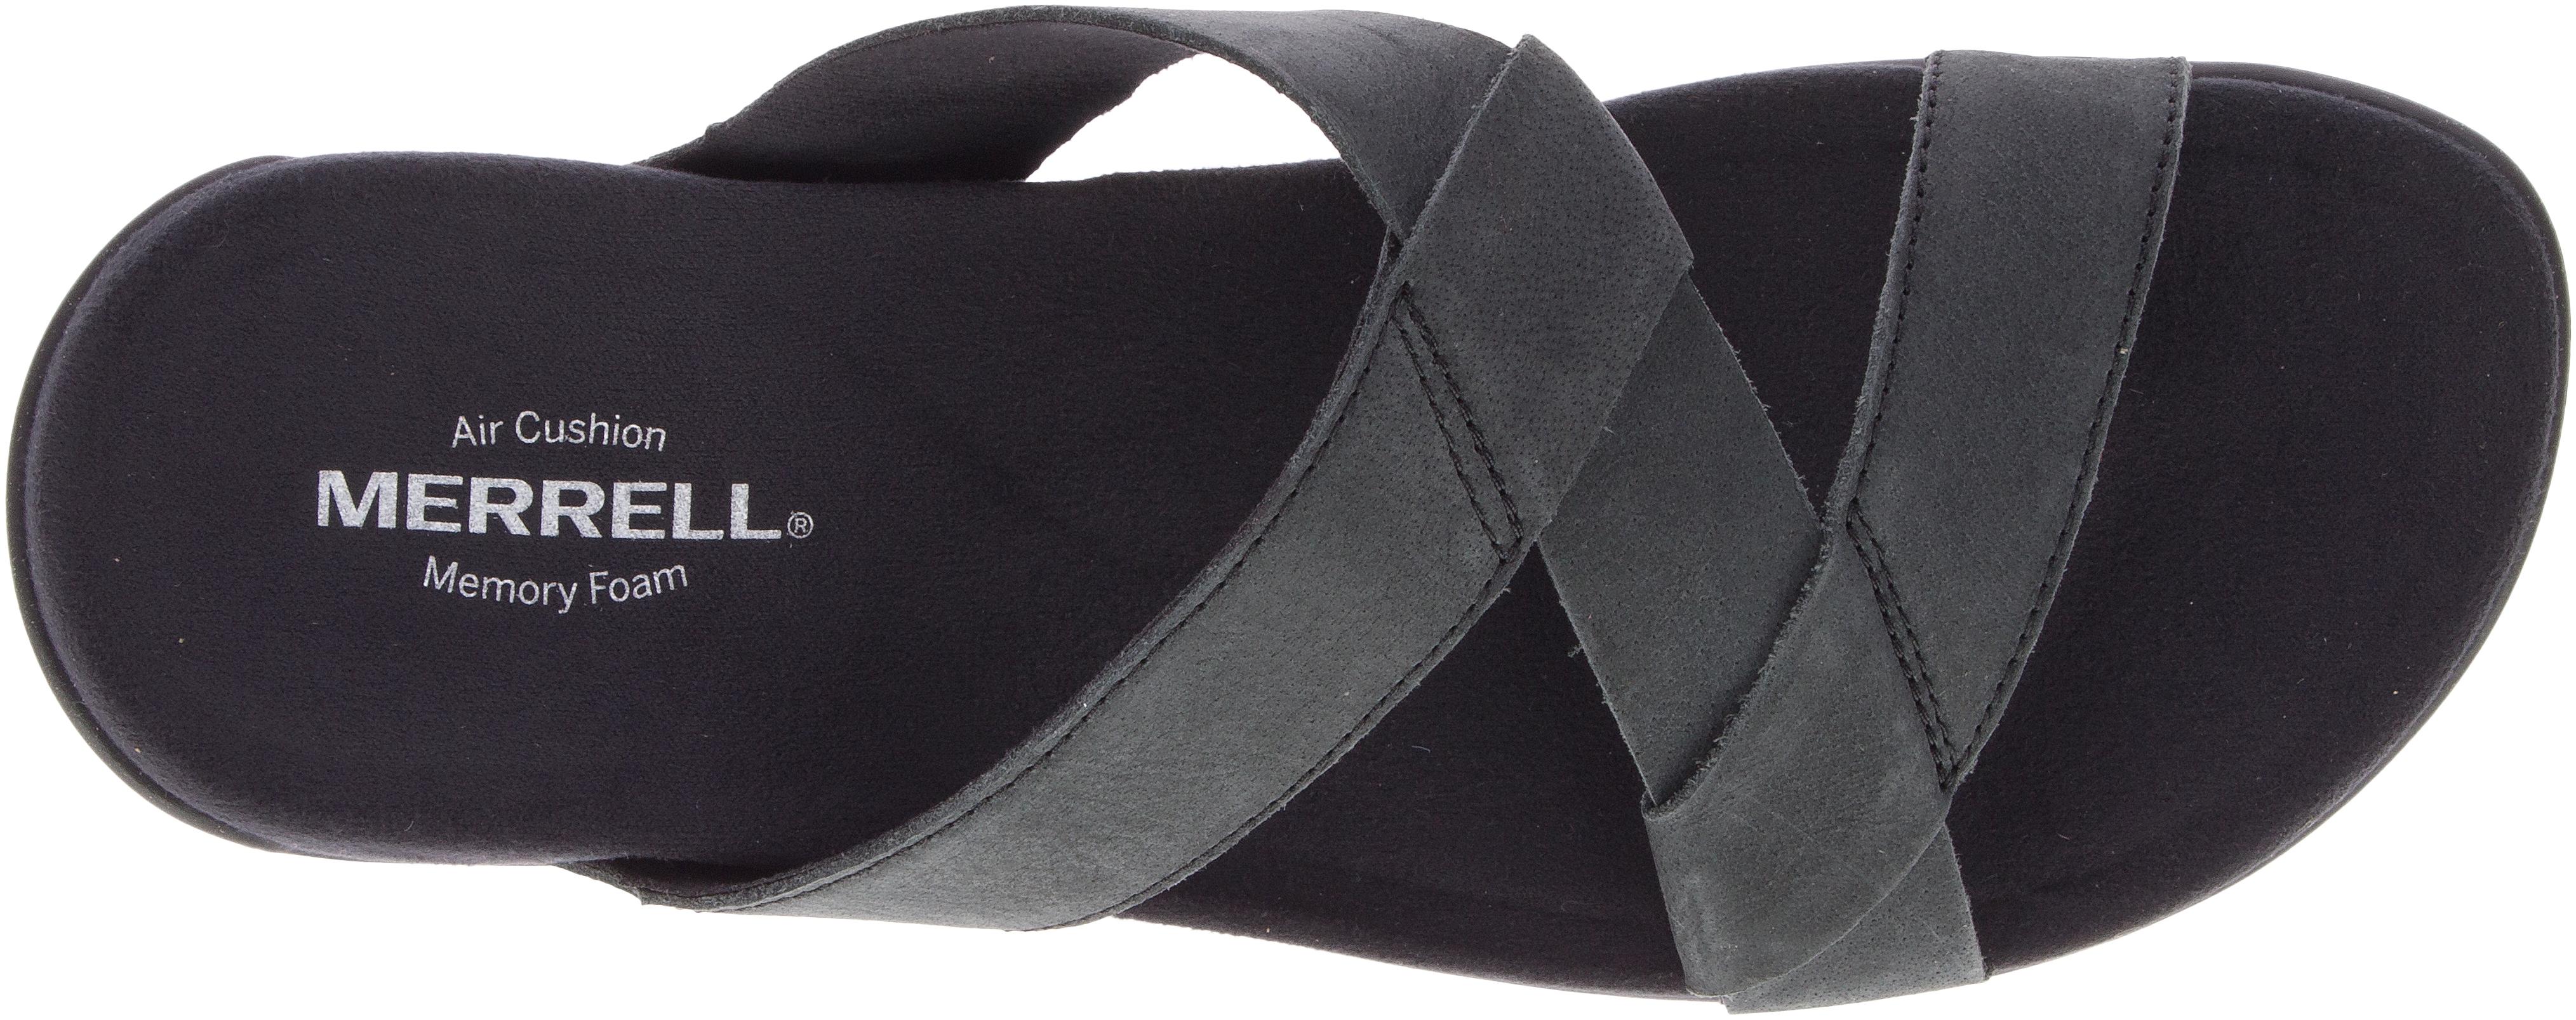 District Kanoya Slide, Black